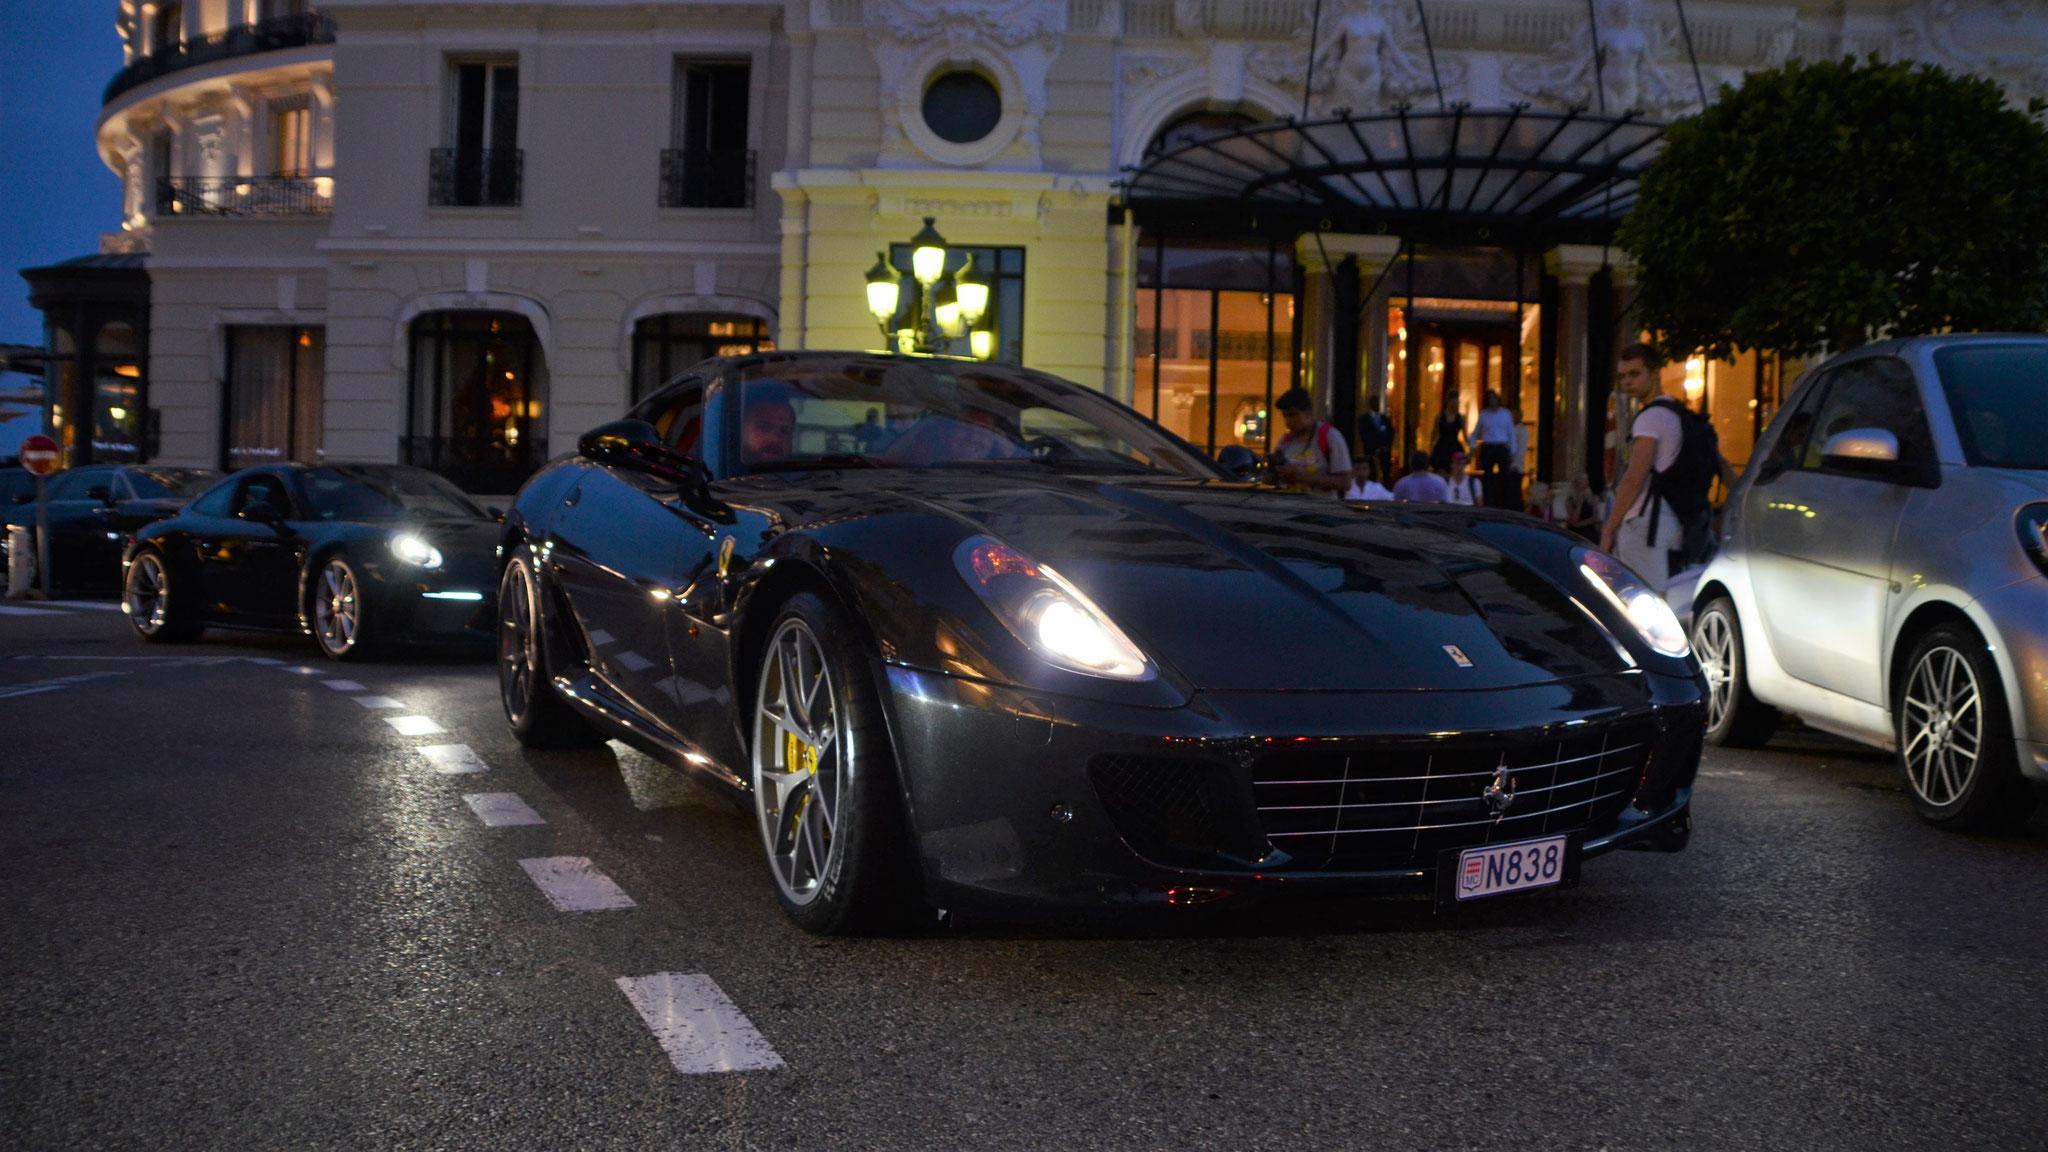 Ferrari 599 GTB - N838 (MC)